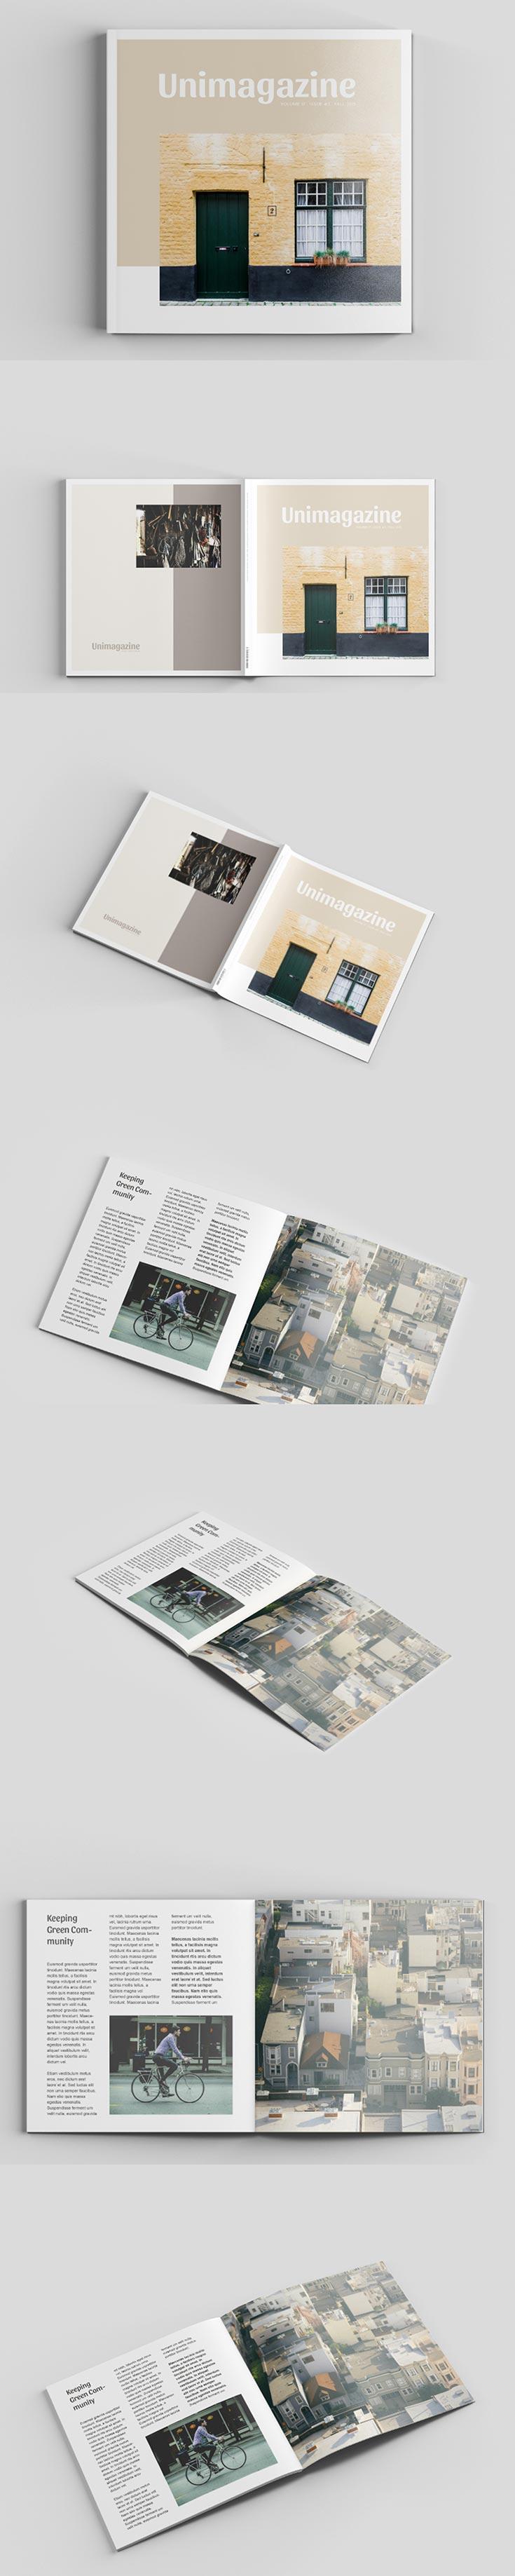 Free Square Magazine Mockup Version